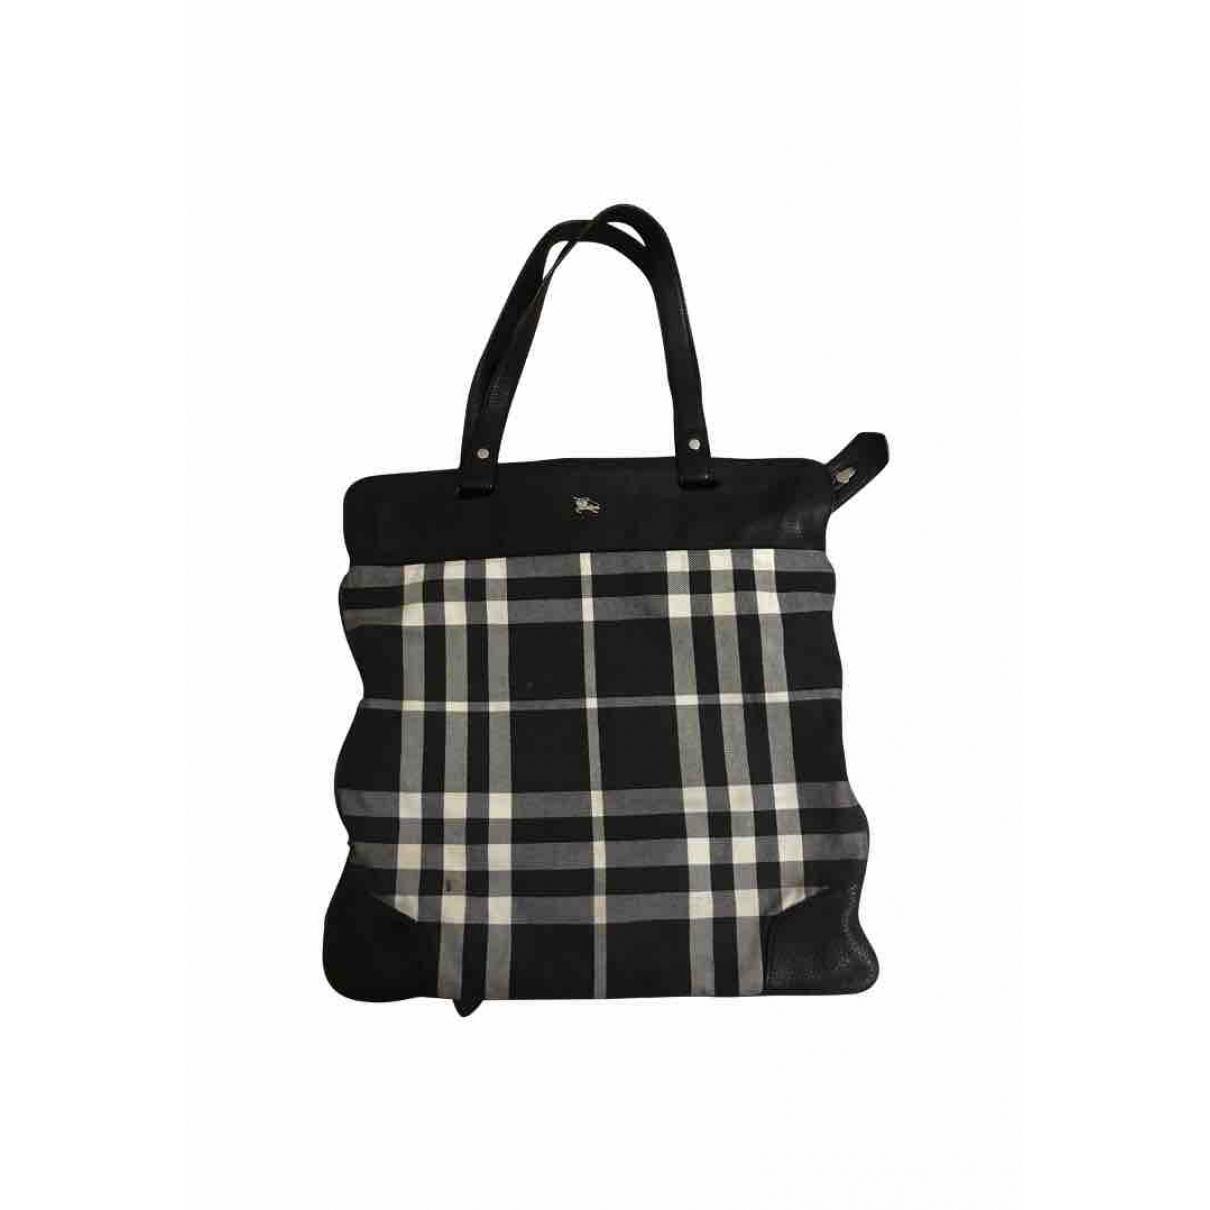 Burberry \N Black Cotton handbag for Women \N